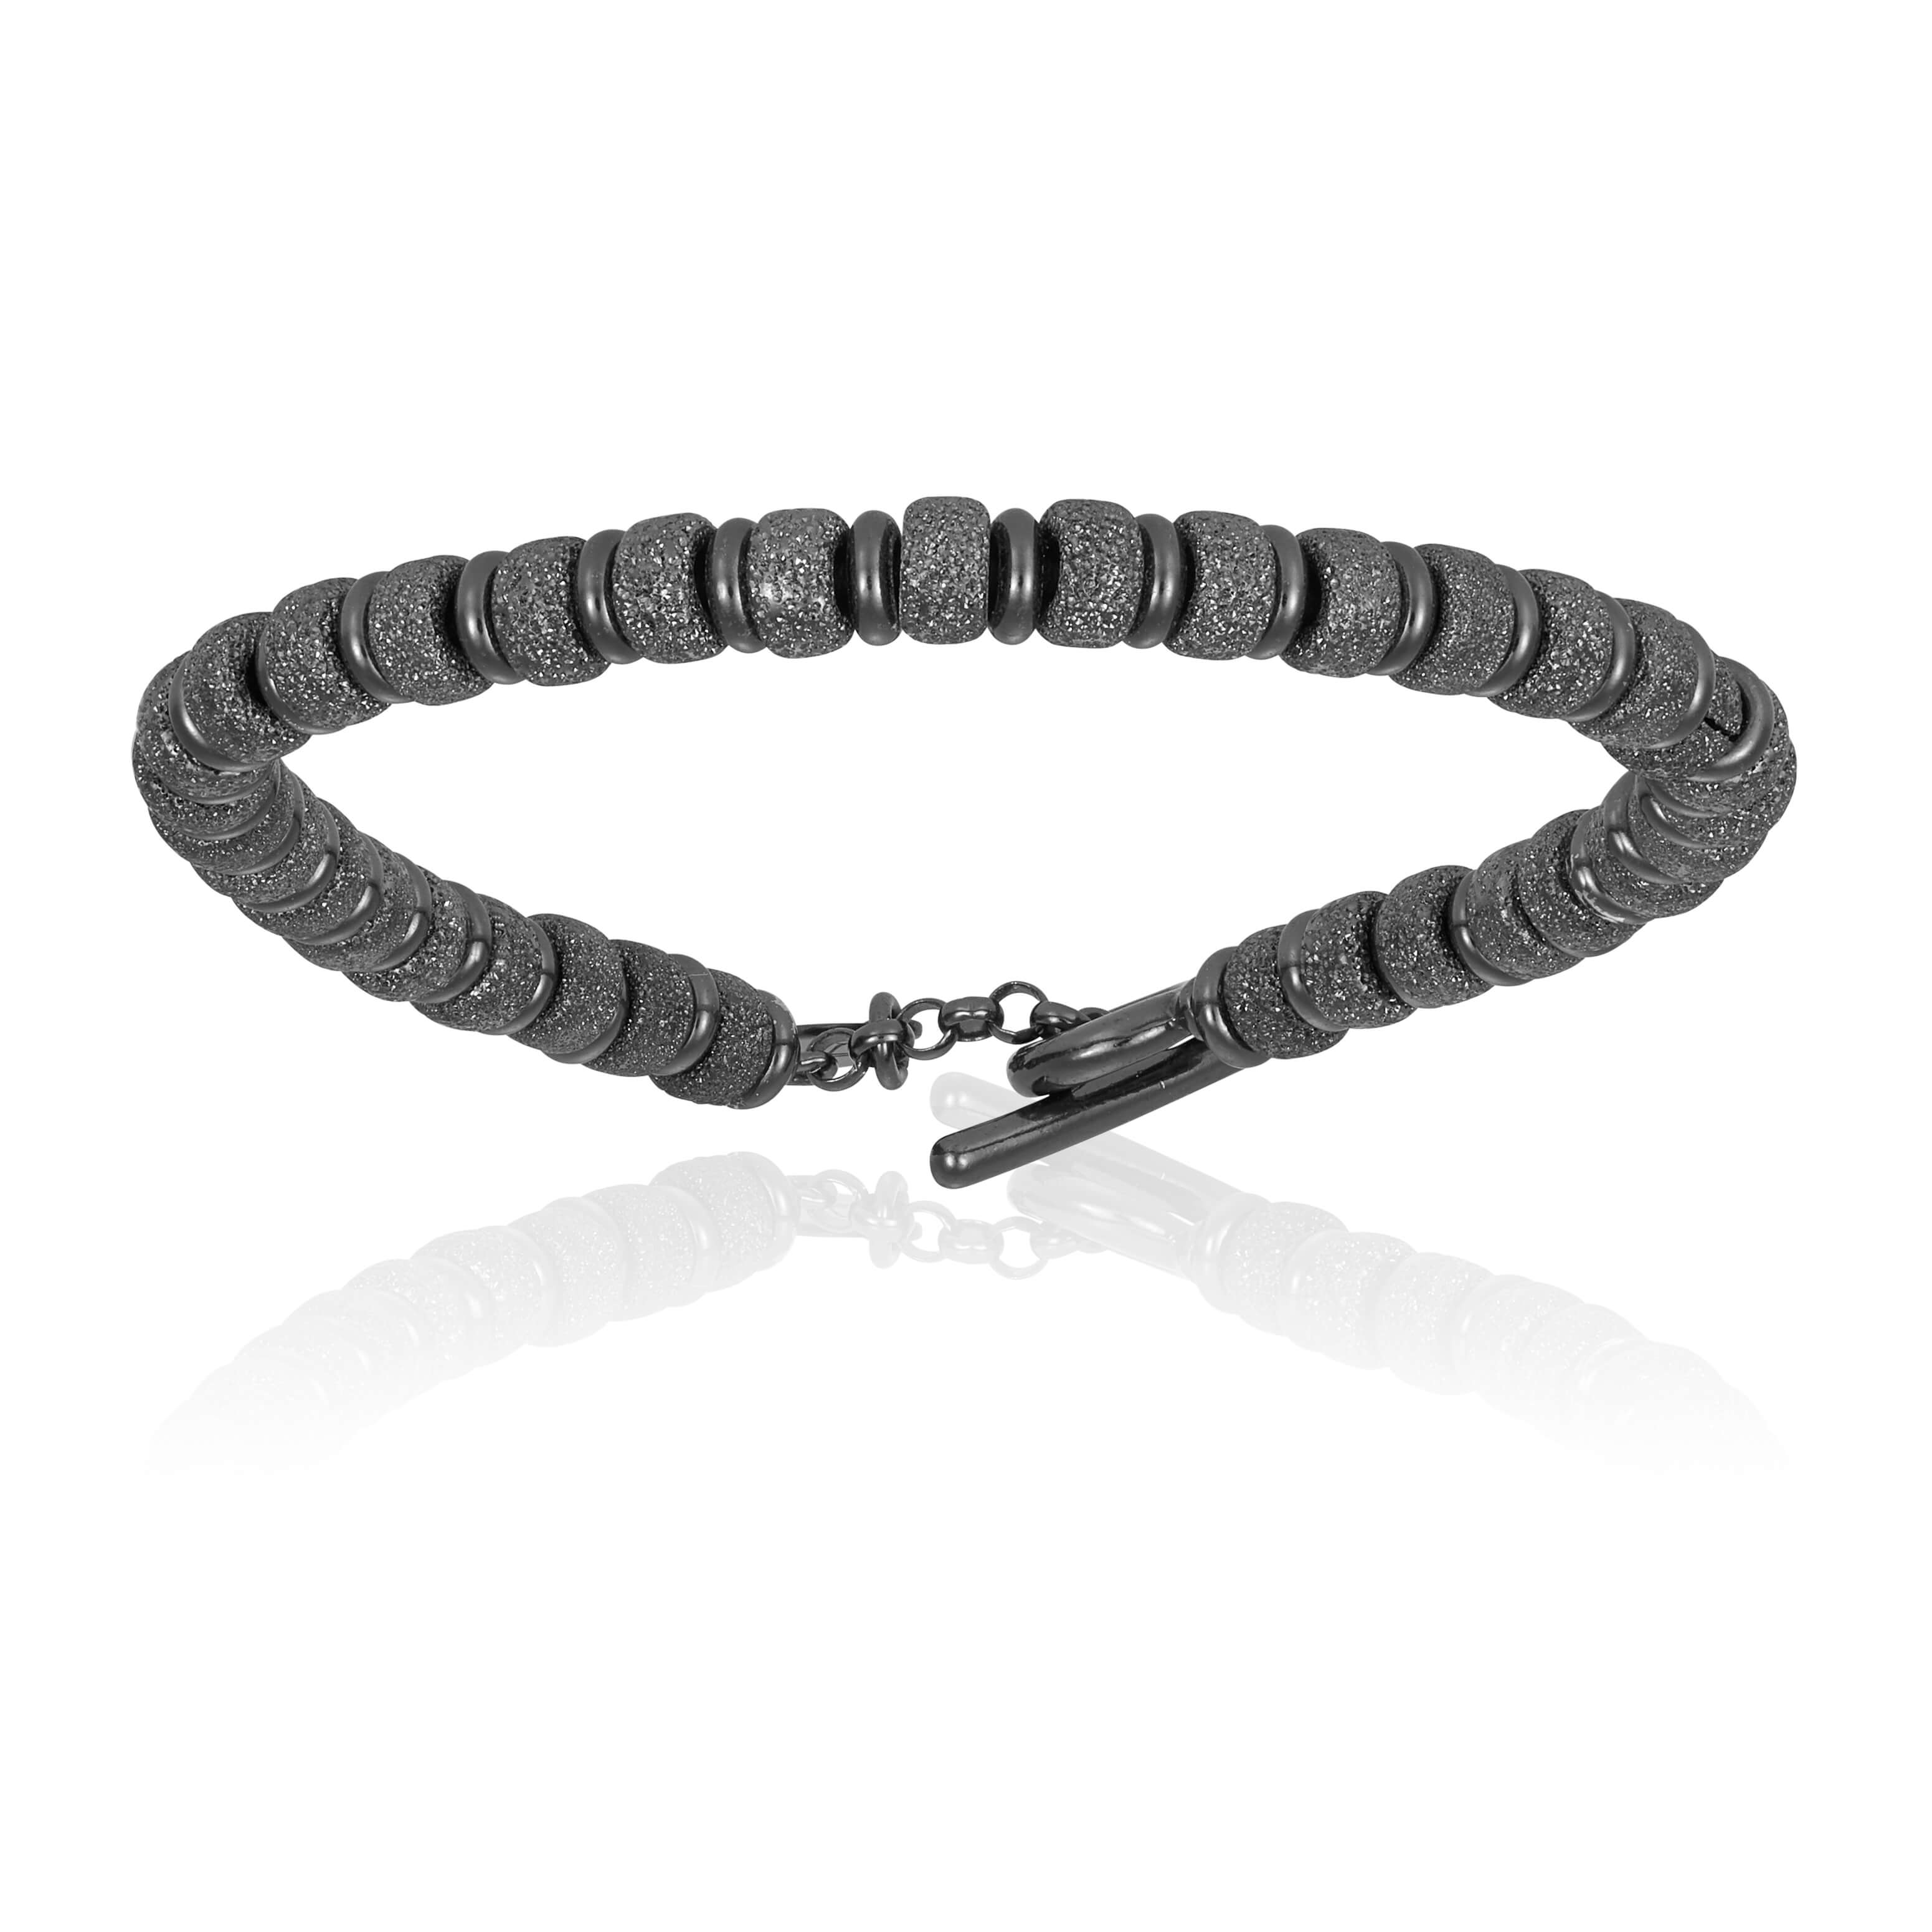 Black PVD bracelet with black beads (Unisex)